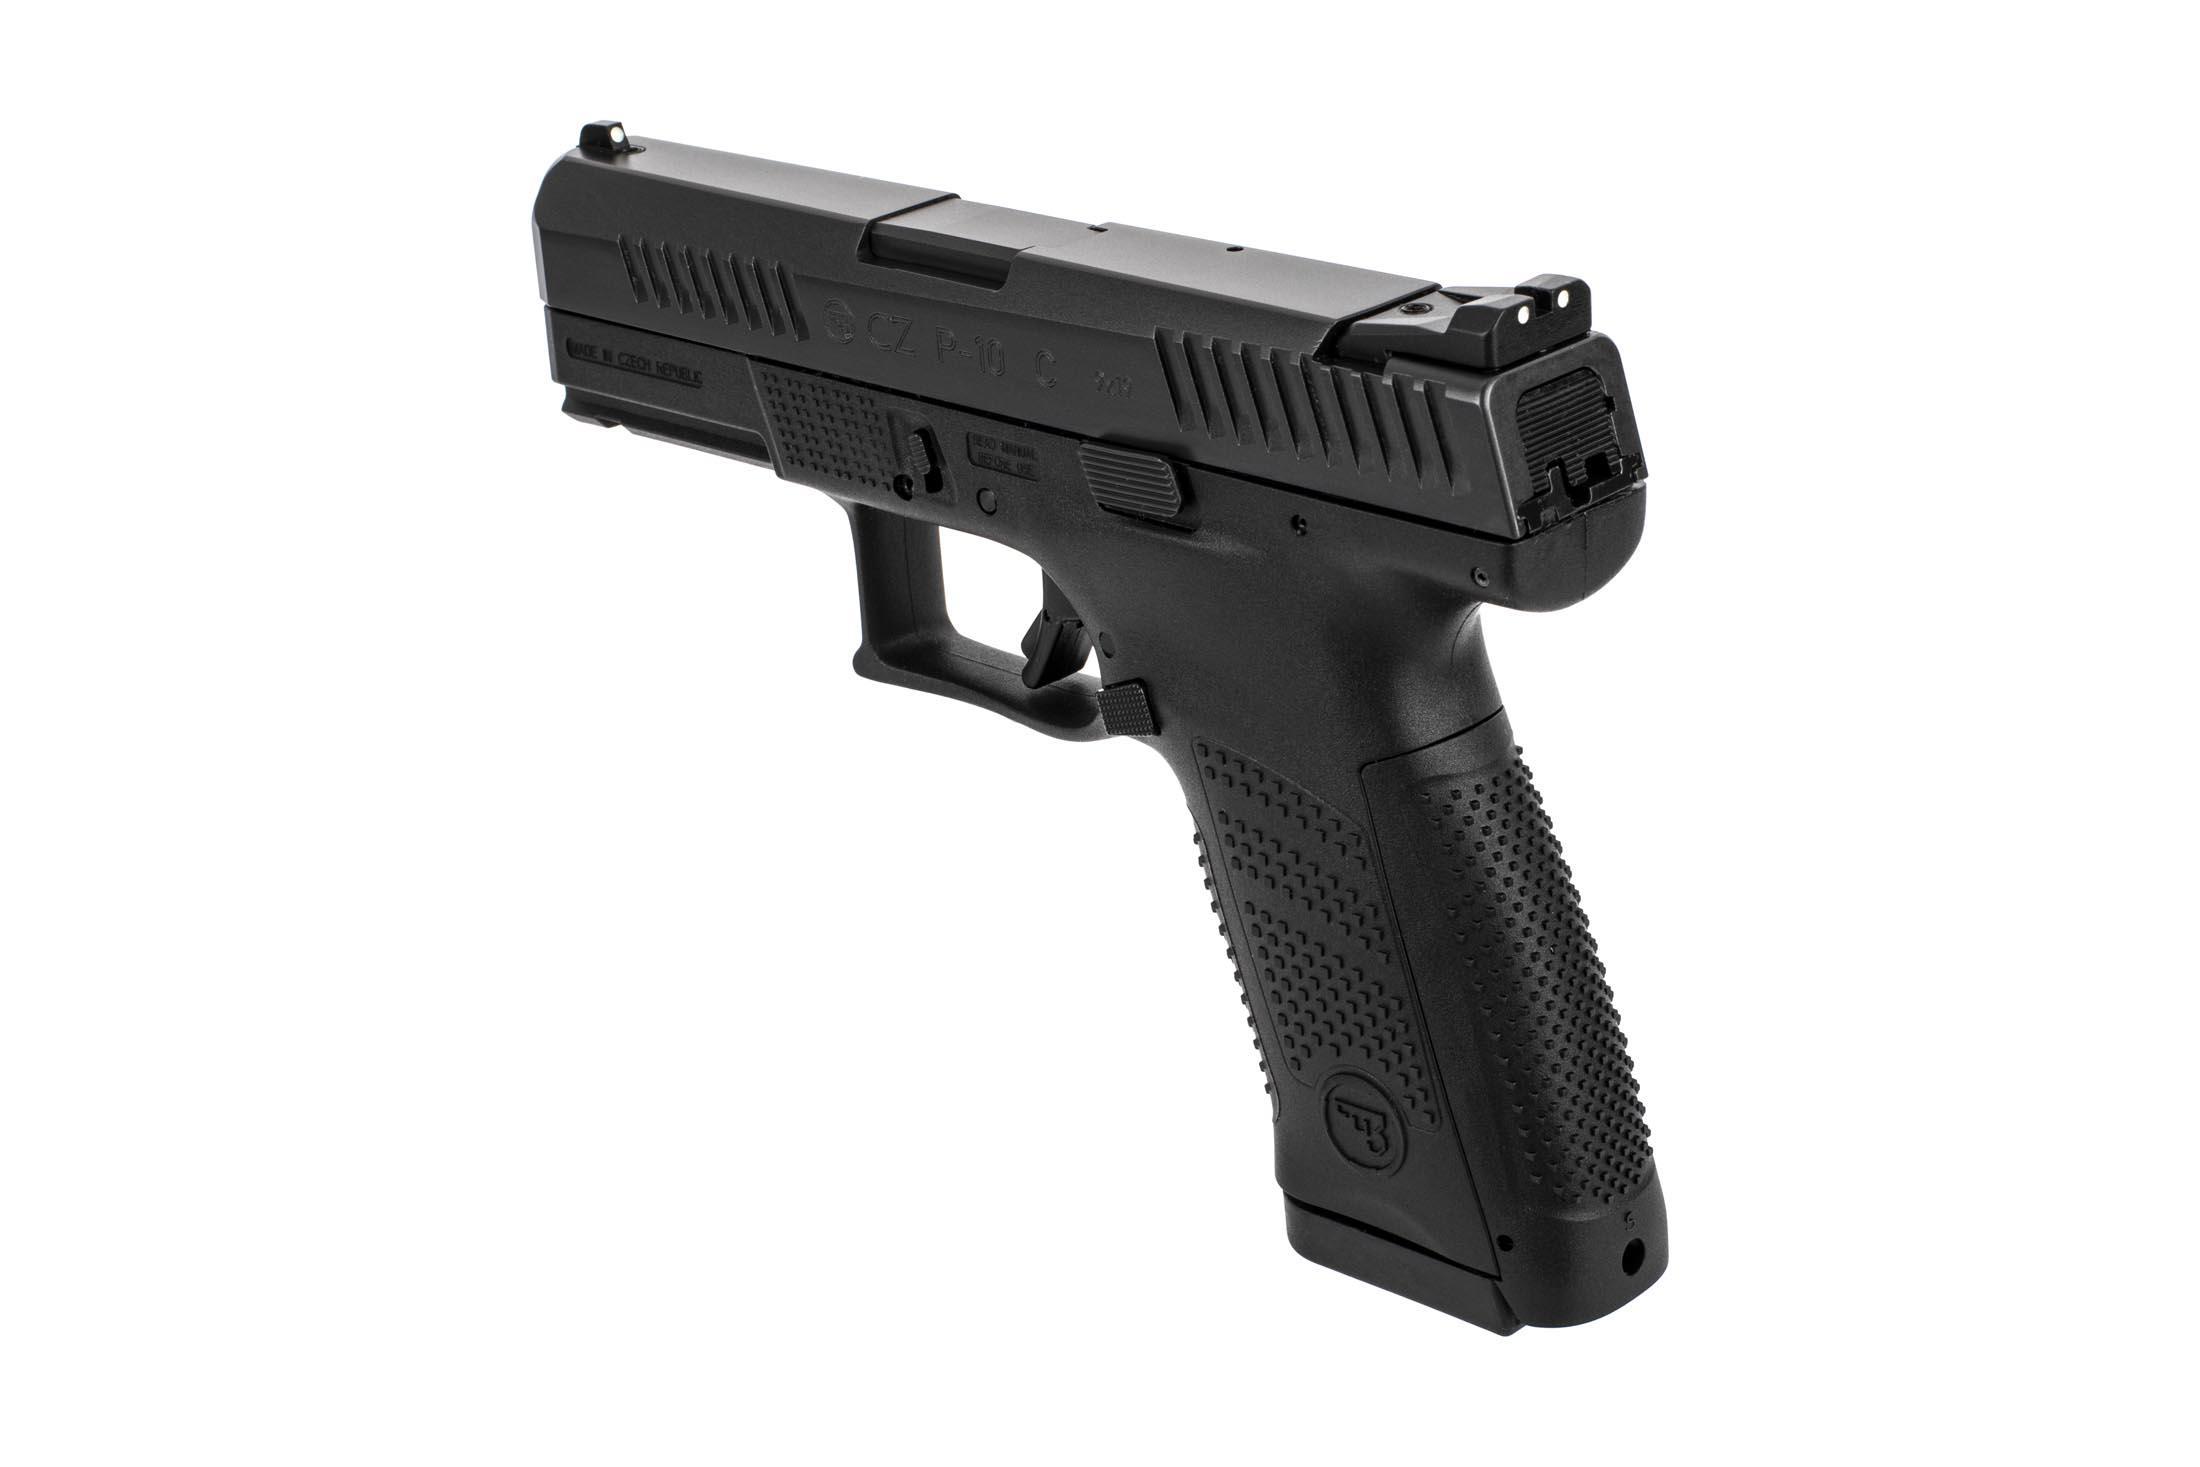 CZ USA P-10 C Striker Fired Compact 9mm Pistol Black - 15 Round